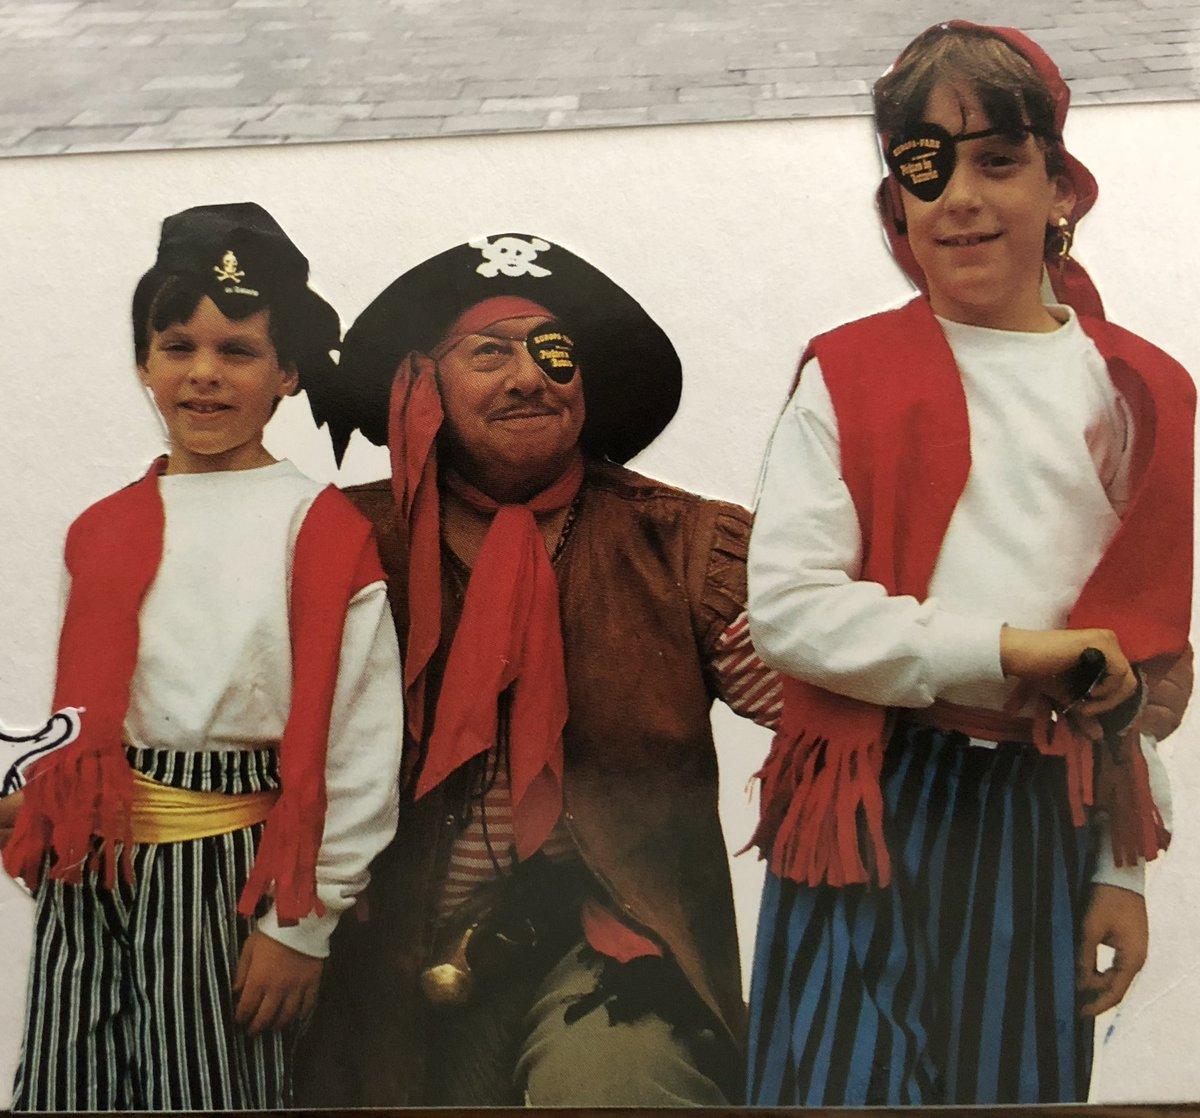 Europa-Park - Michael et Thomas Mack en 1987